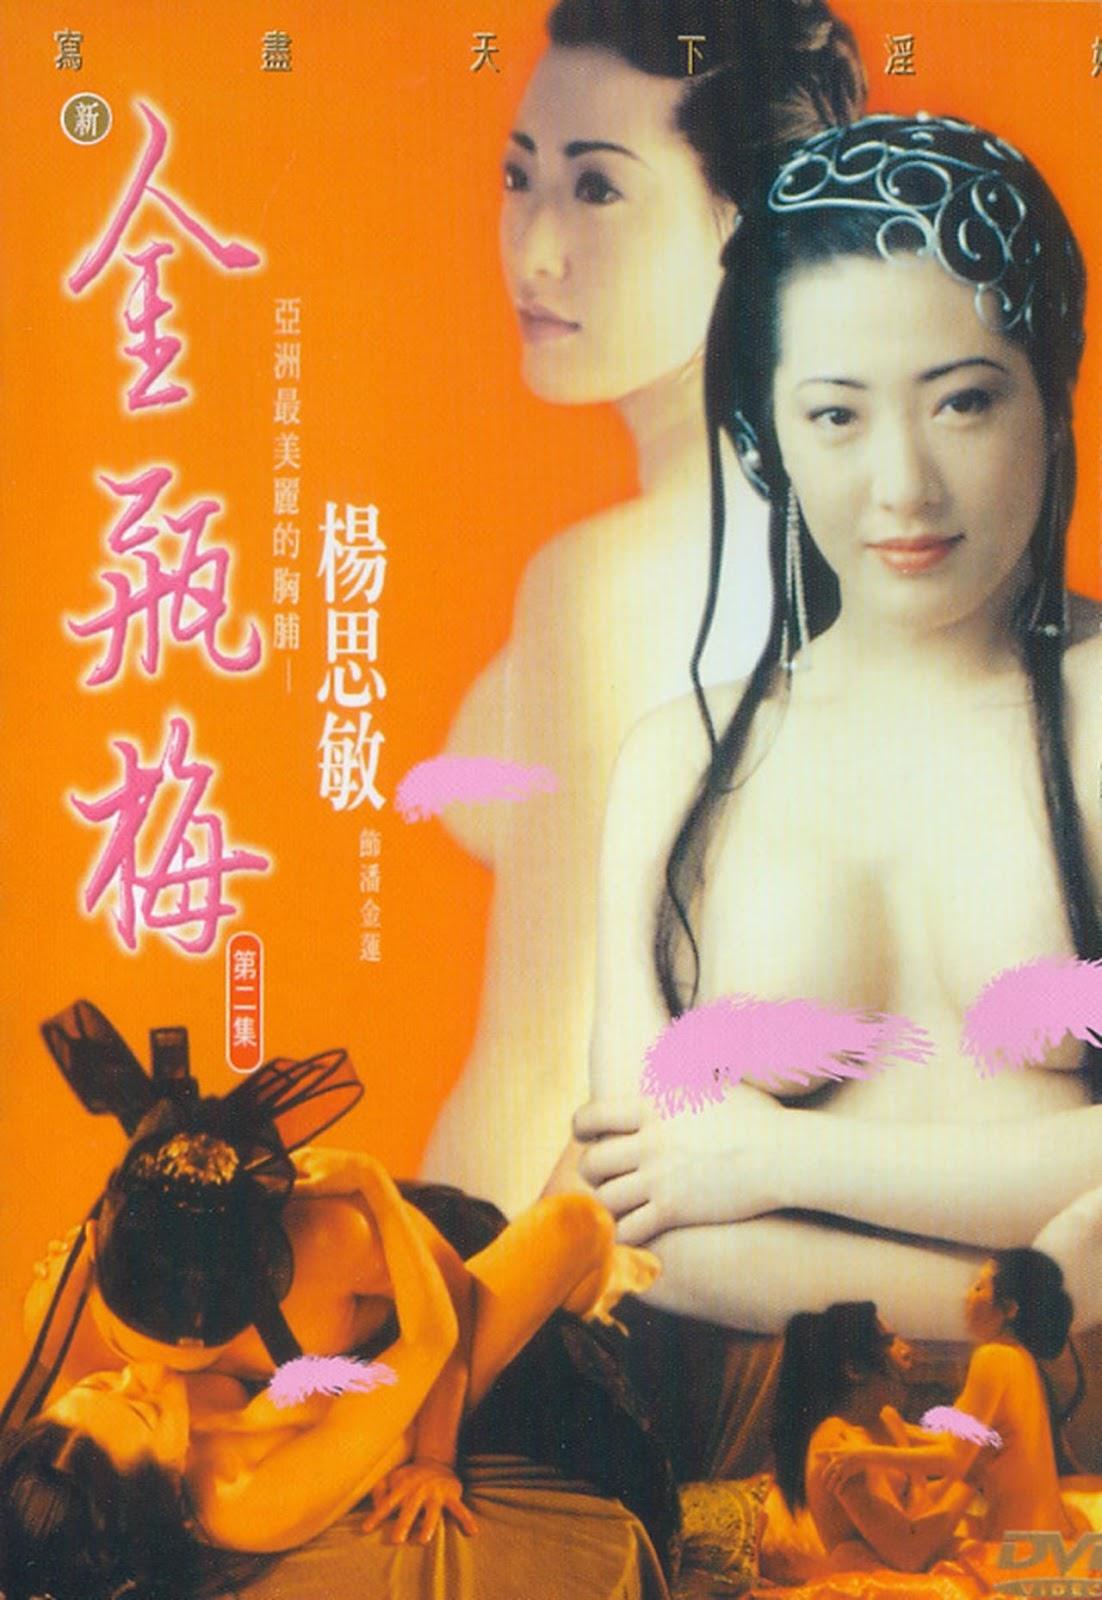 New Jin Ping Mei 2 (Jin Ping Mei) Full CHINA 18+ Watch Movie Online Free